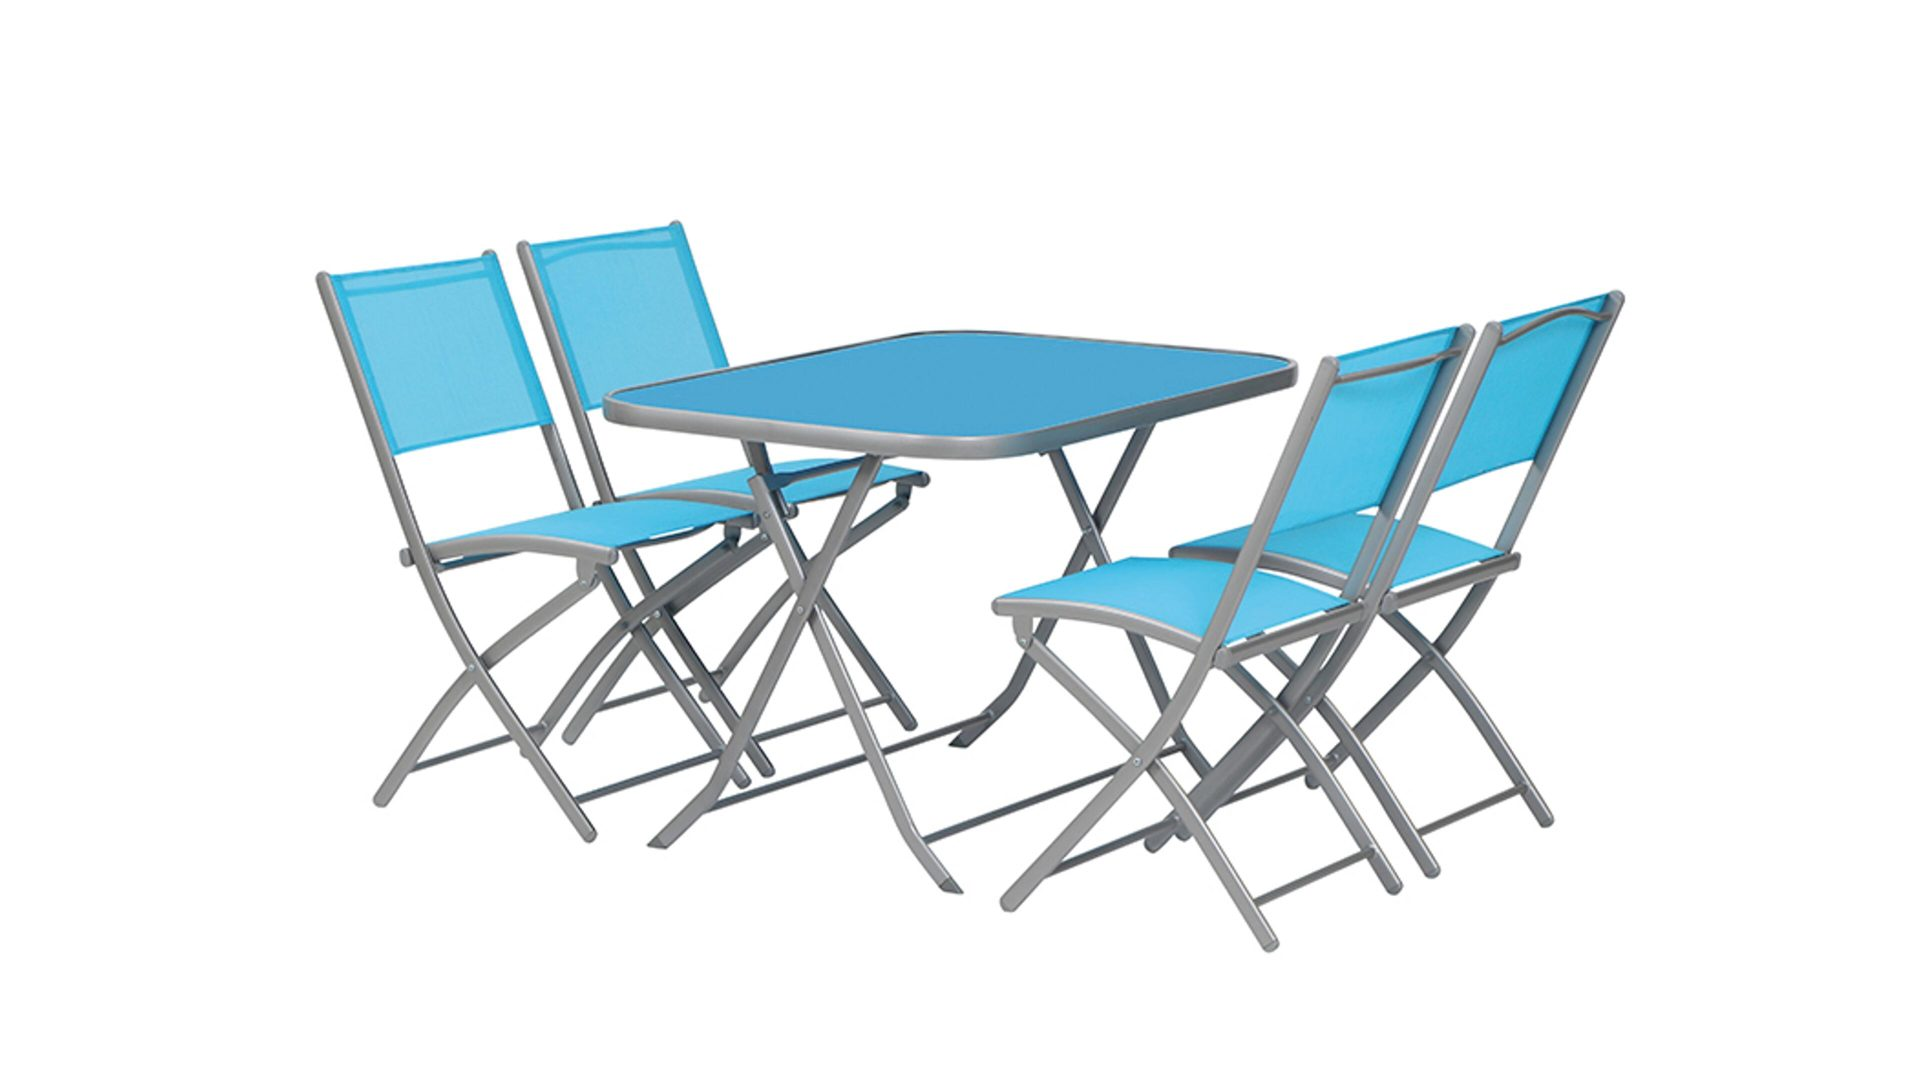 siena GARDEN Balkon-Set Kalua, silberfarbenes Stahlgestell & blauer ...